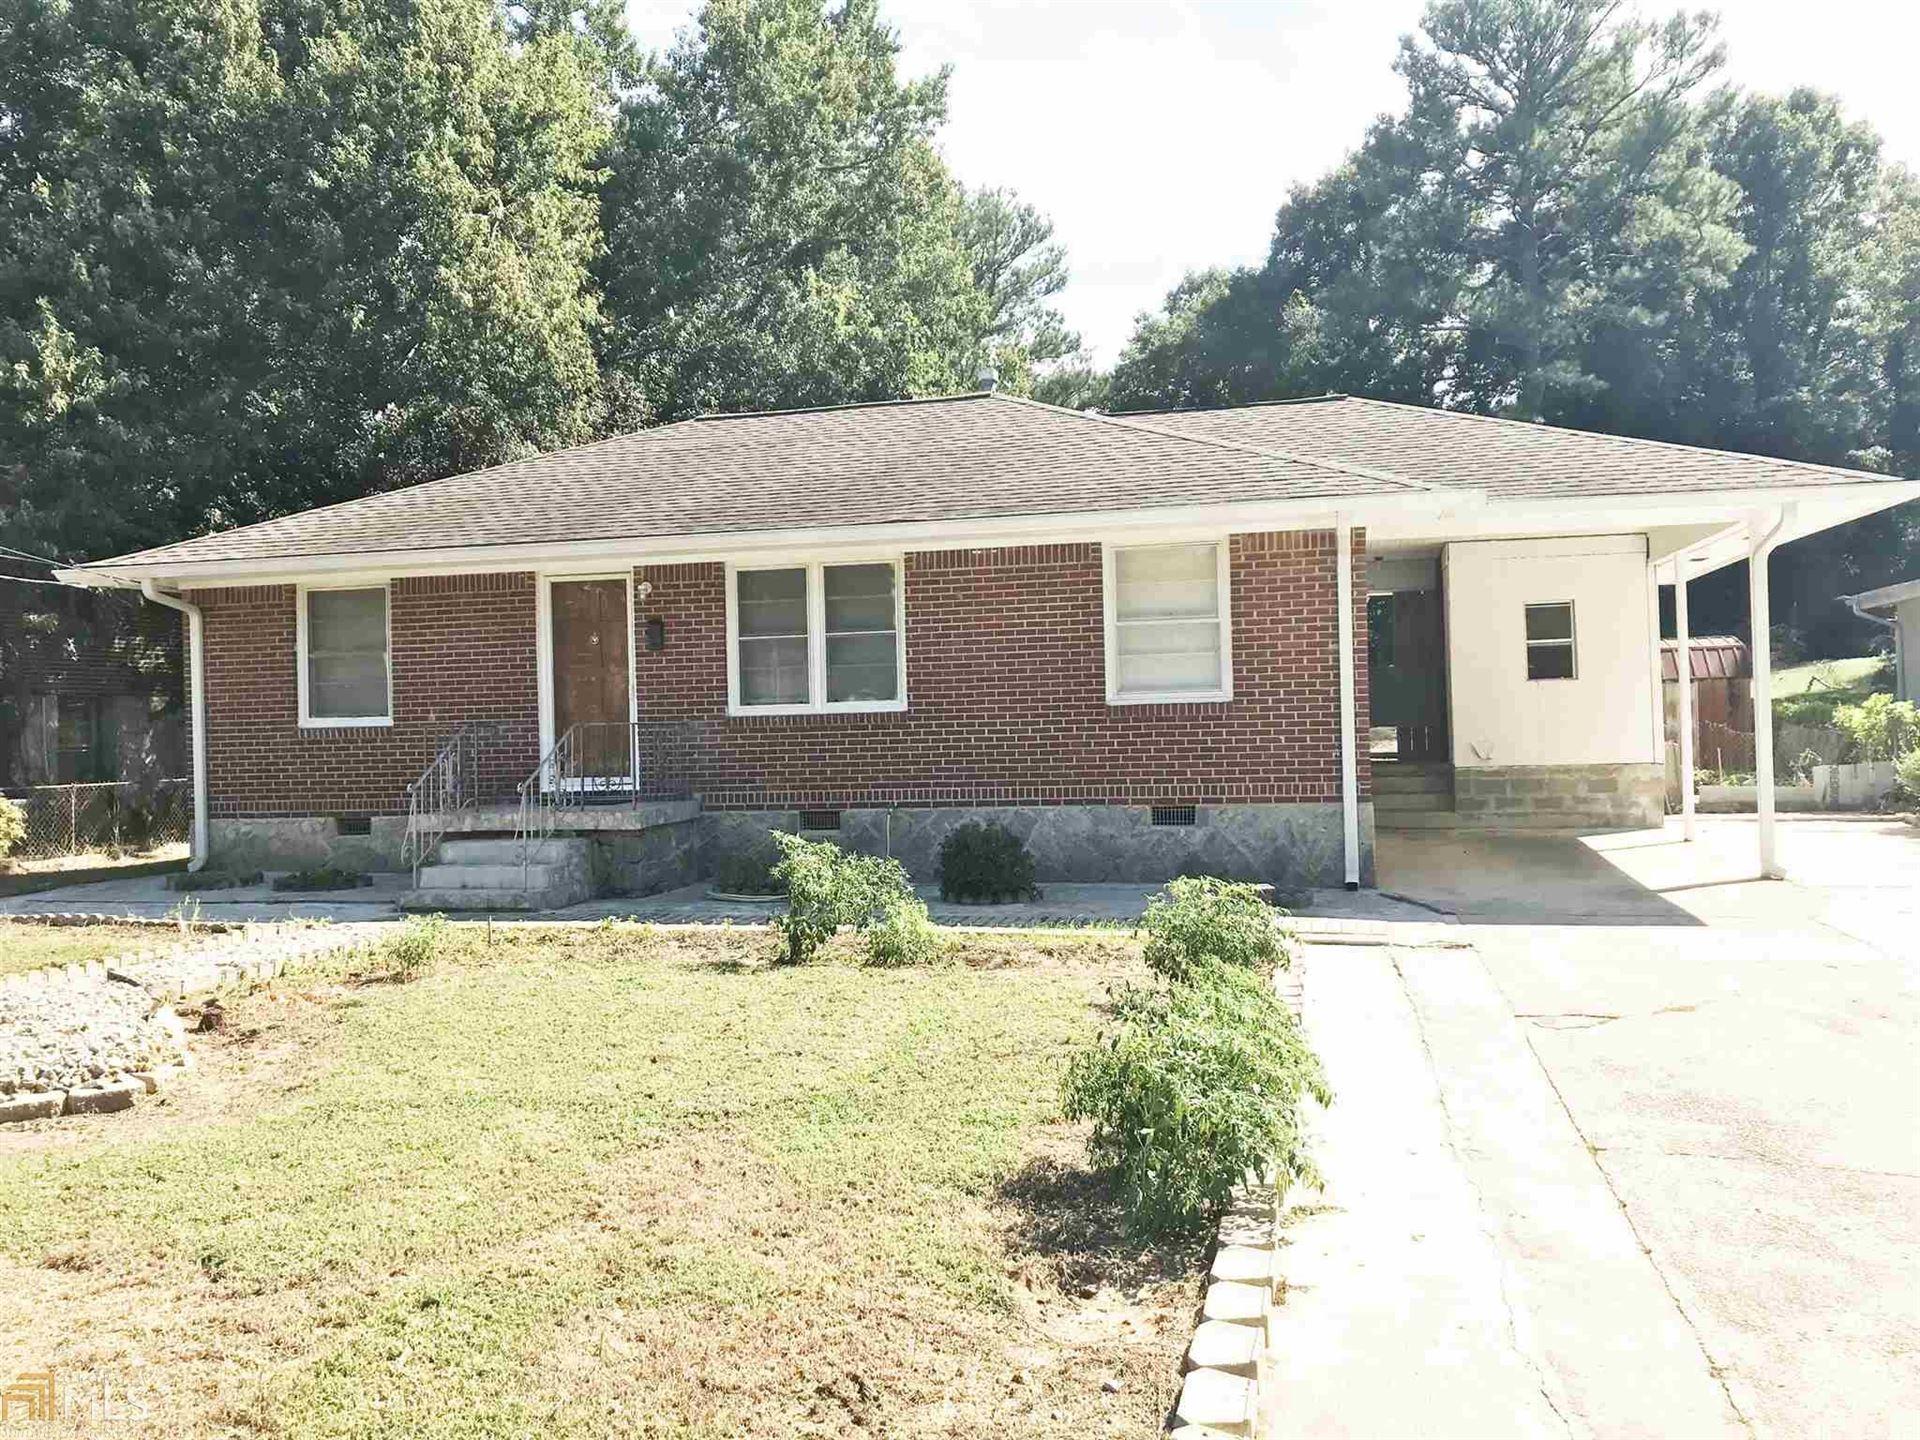 819 Pine Valley Dr, Forest Park, GA 30297 - #: 8861325